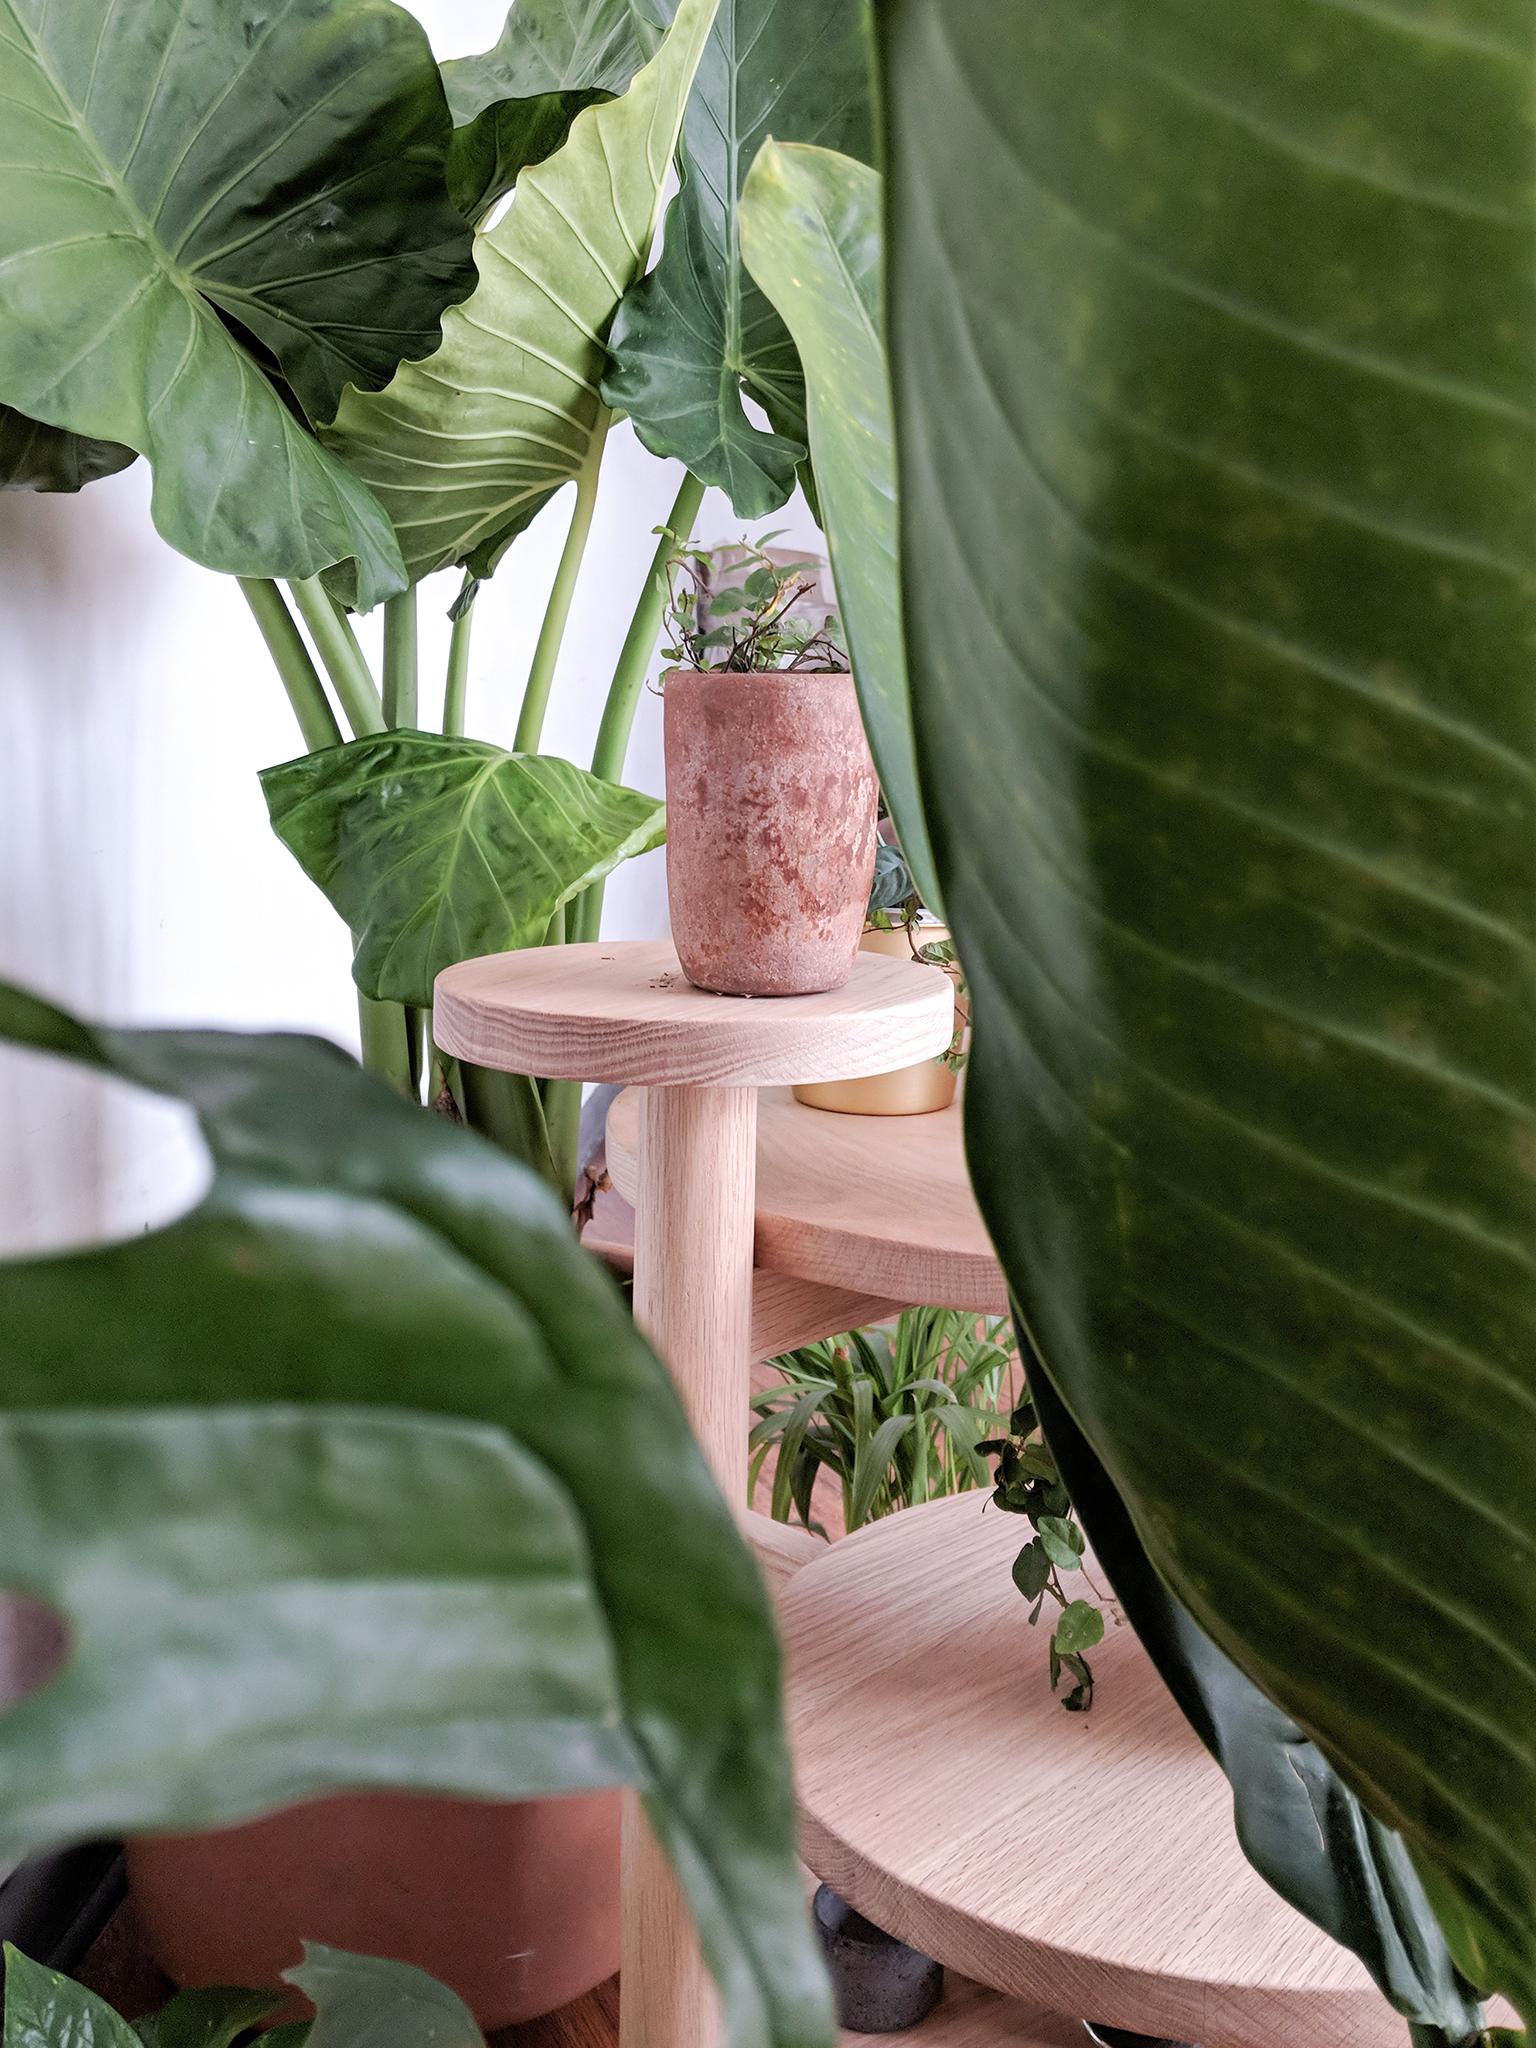 Acuña side table. Detail.